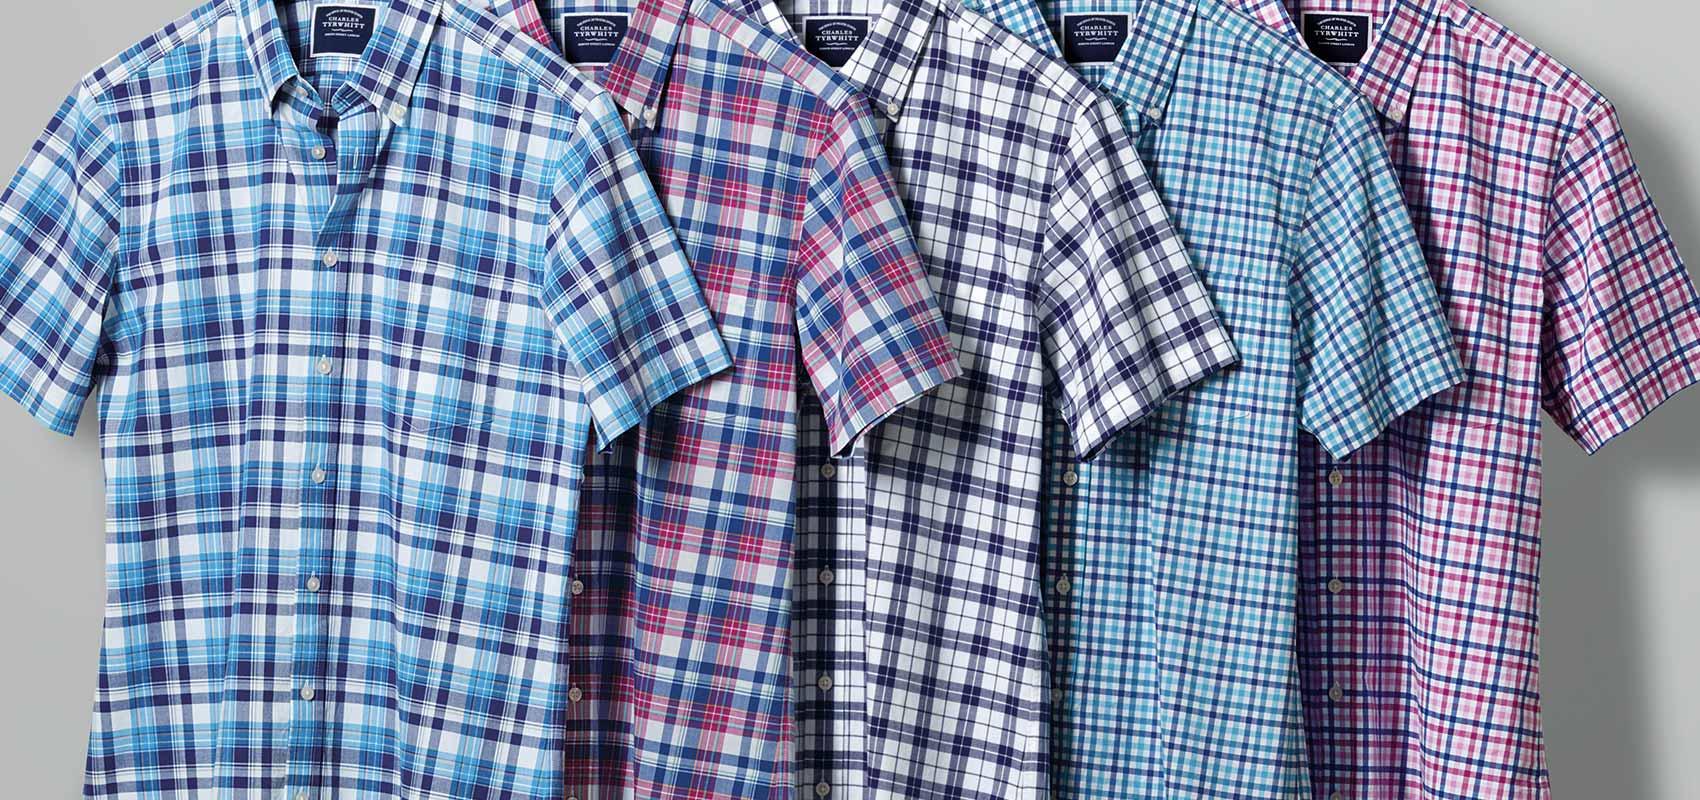 Charles Tyrwhitt short-sleeved shirts